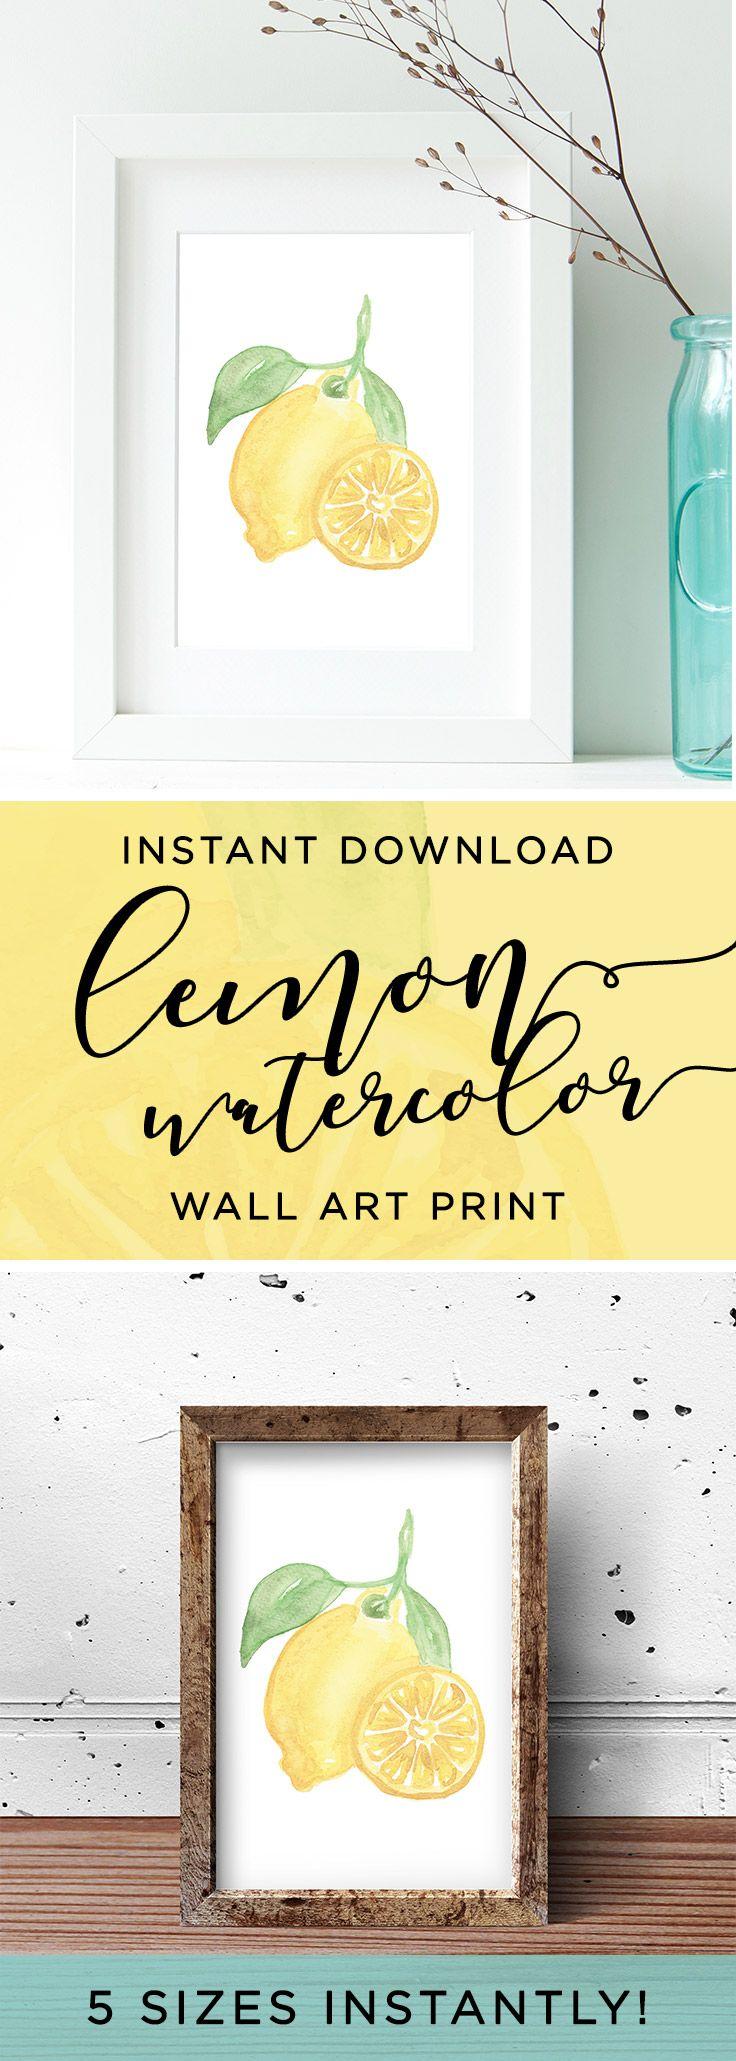 INSTANT DOWNLOAD | $5 Watercolor Lemon Art Print, Lemon Kitchen Wall ...